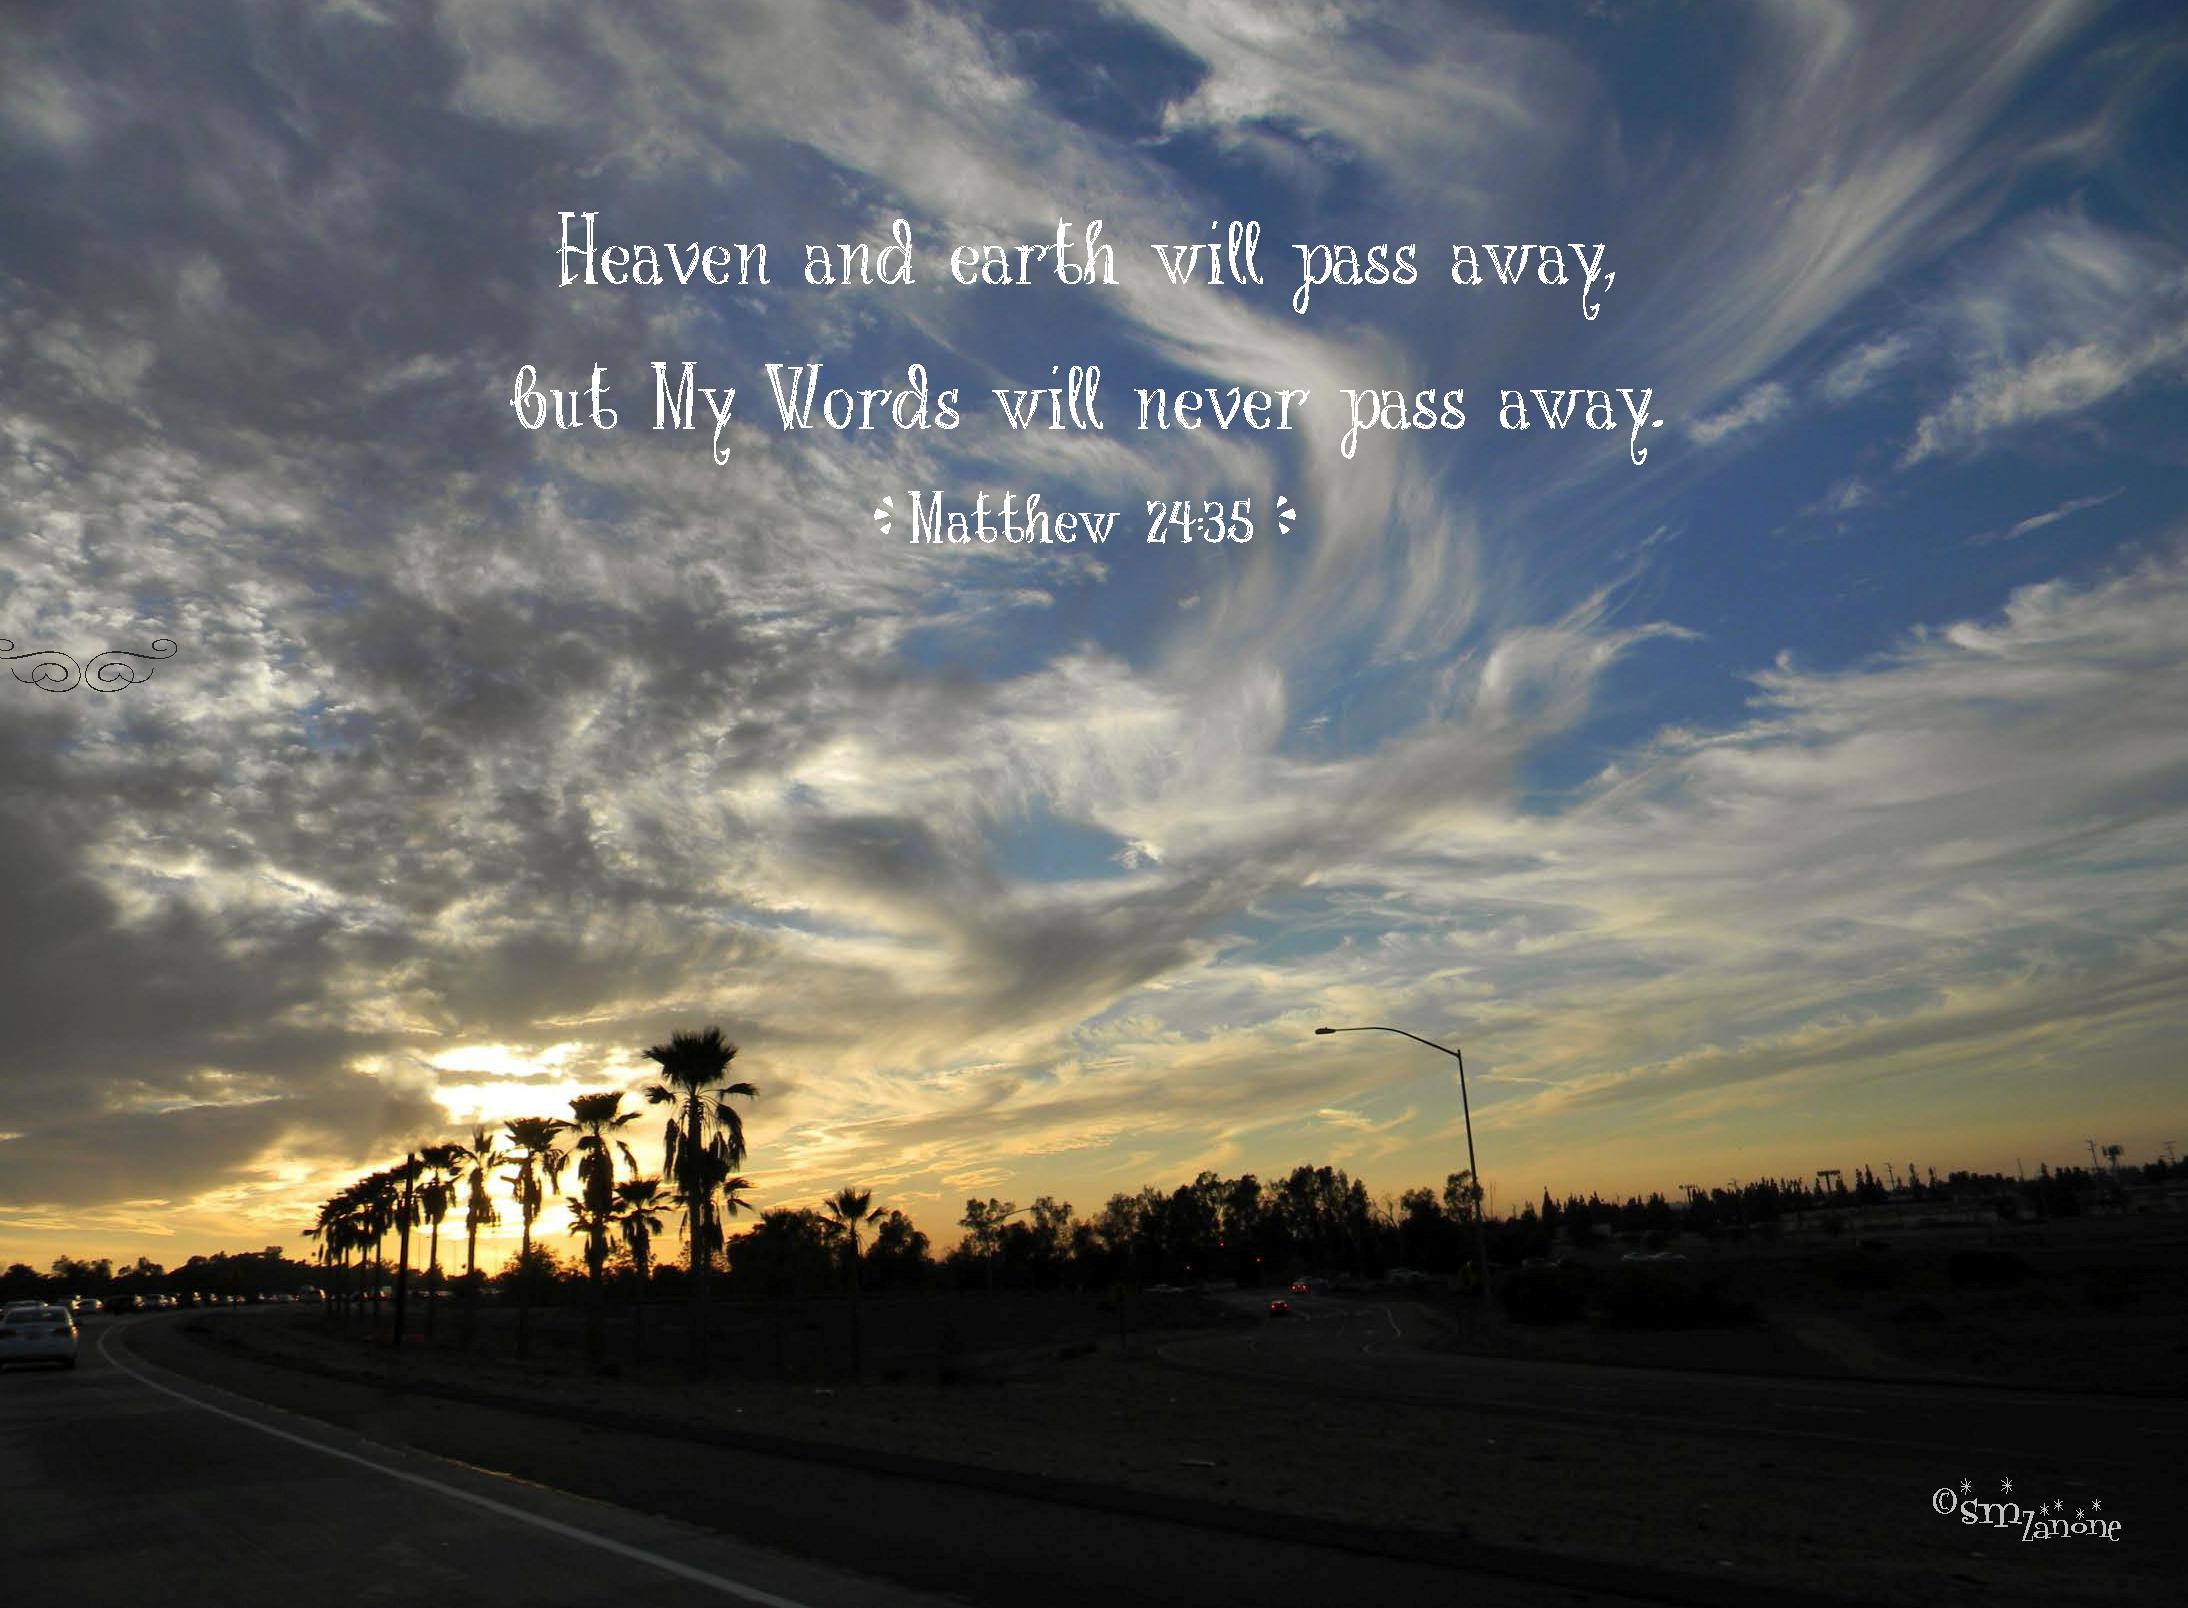 Matthew 24_35